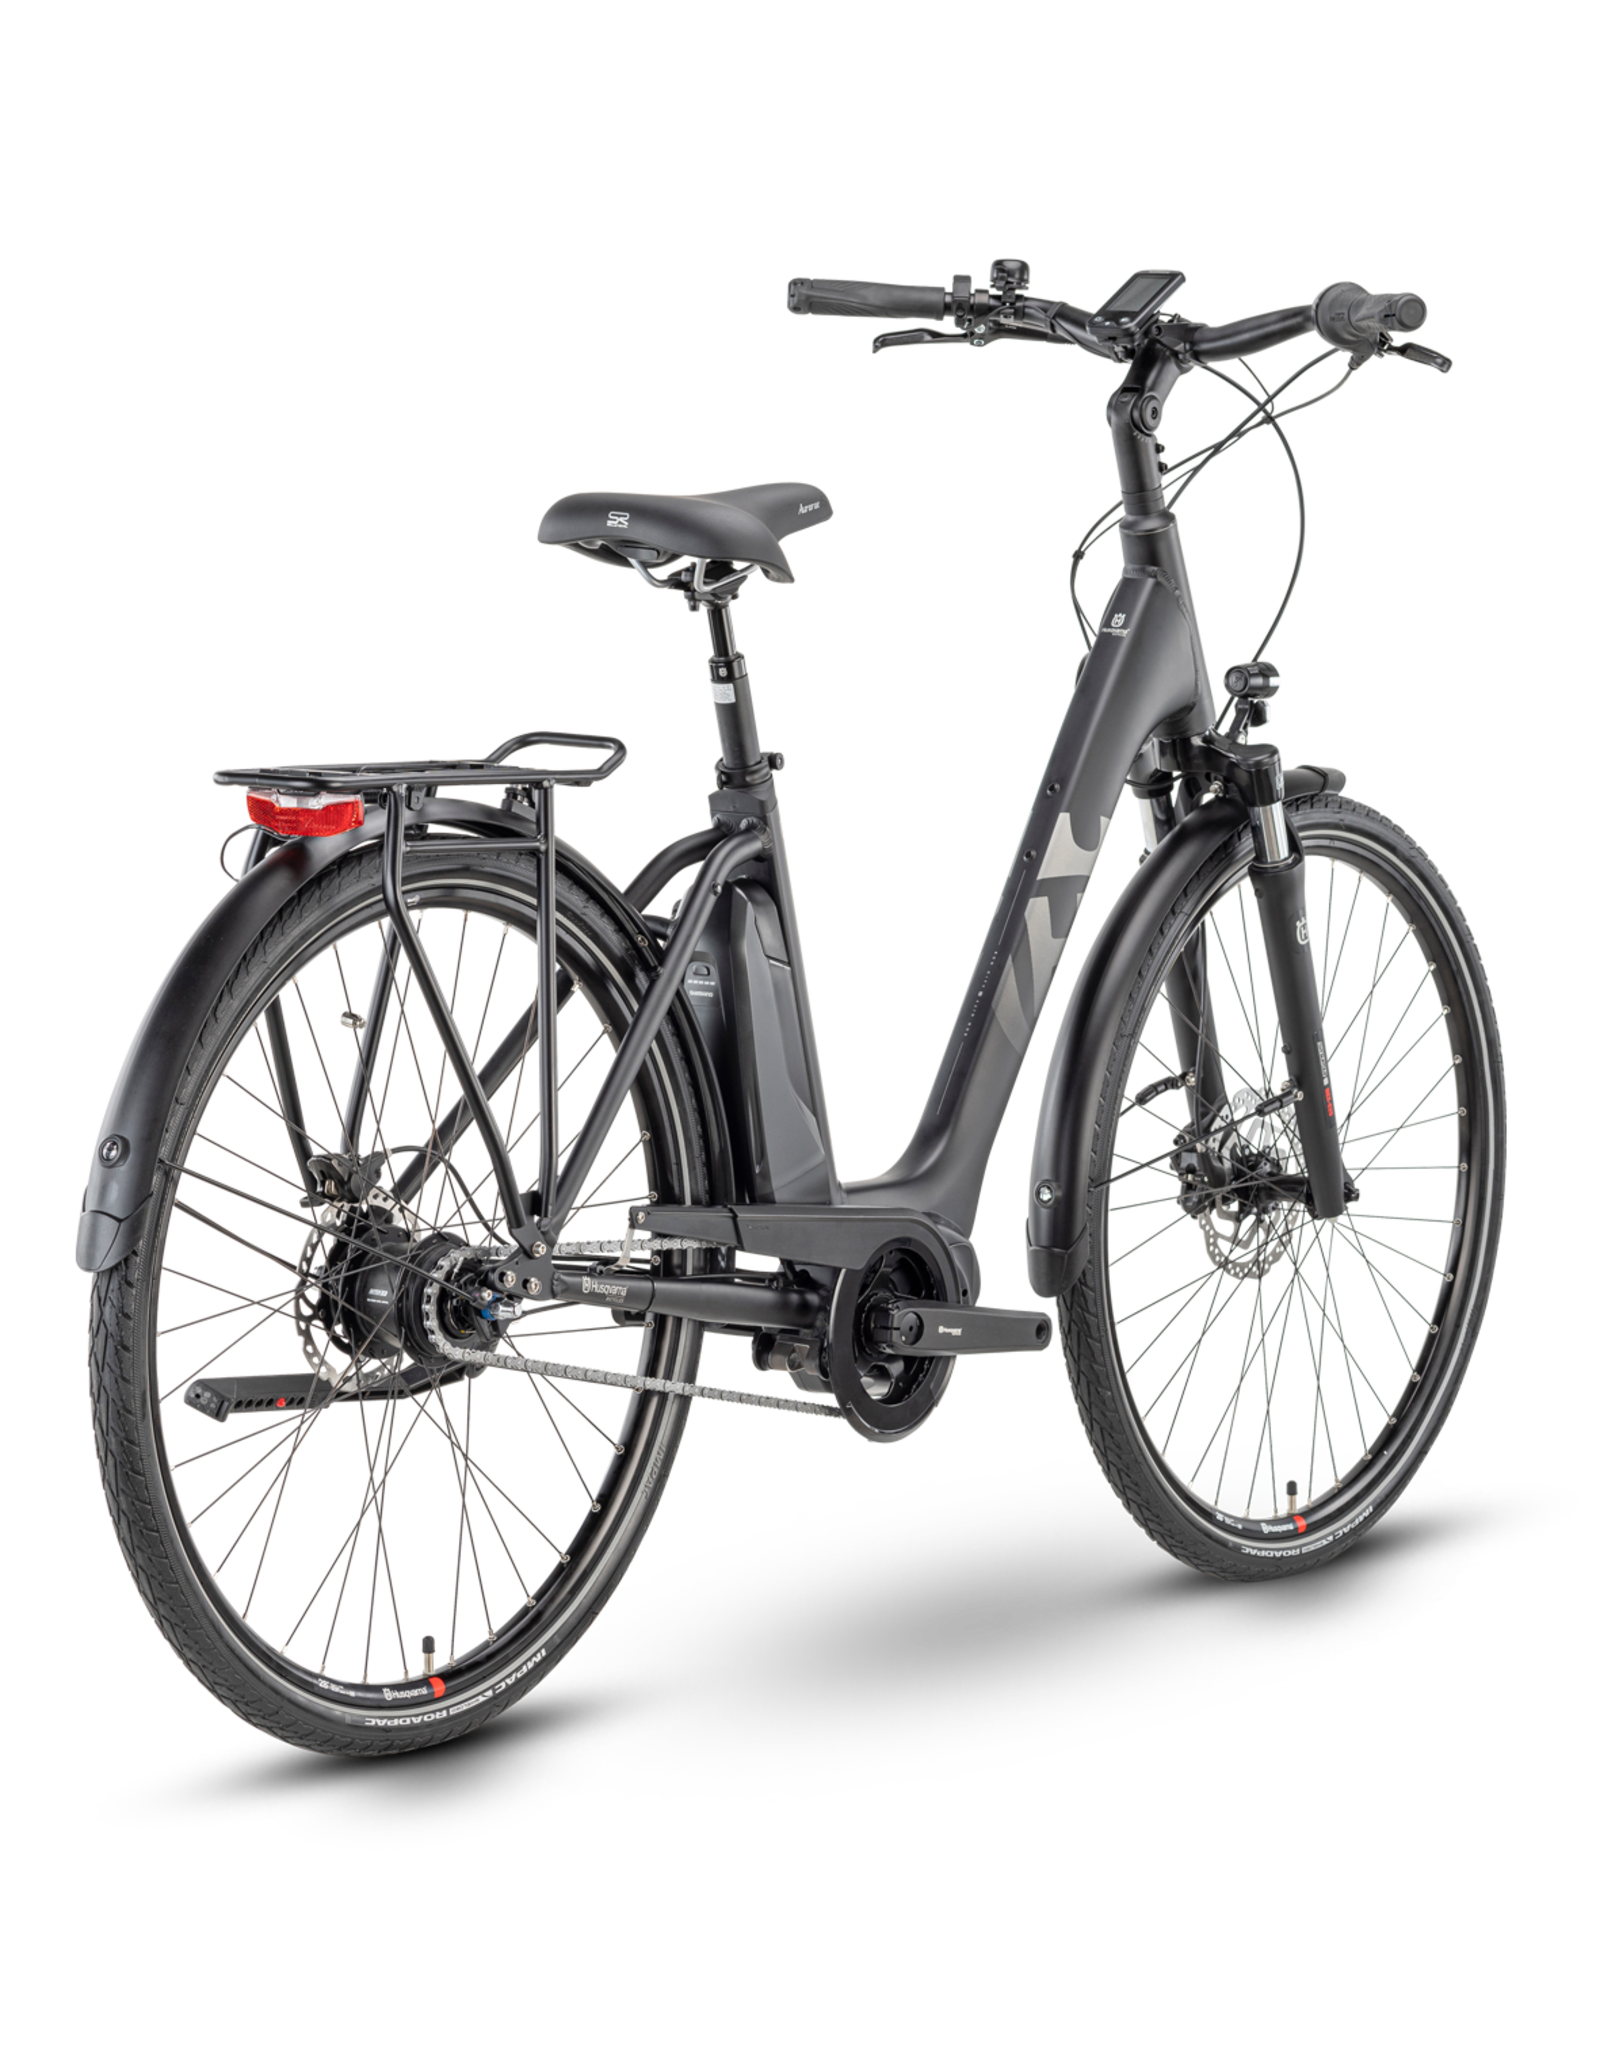 HUSQVARNA Bicycles Husqvarna Bicycles - Eco City EC4 FW -  2021